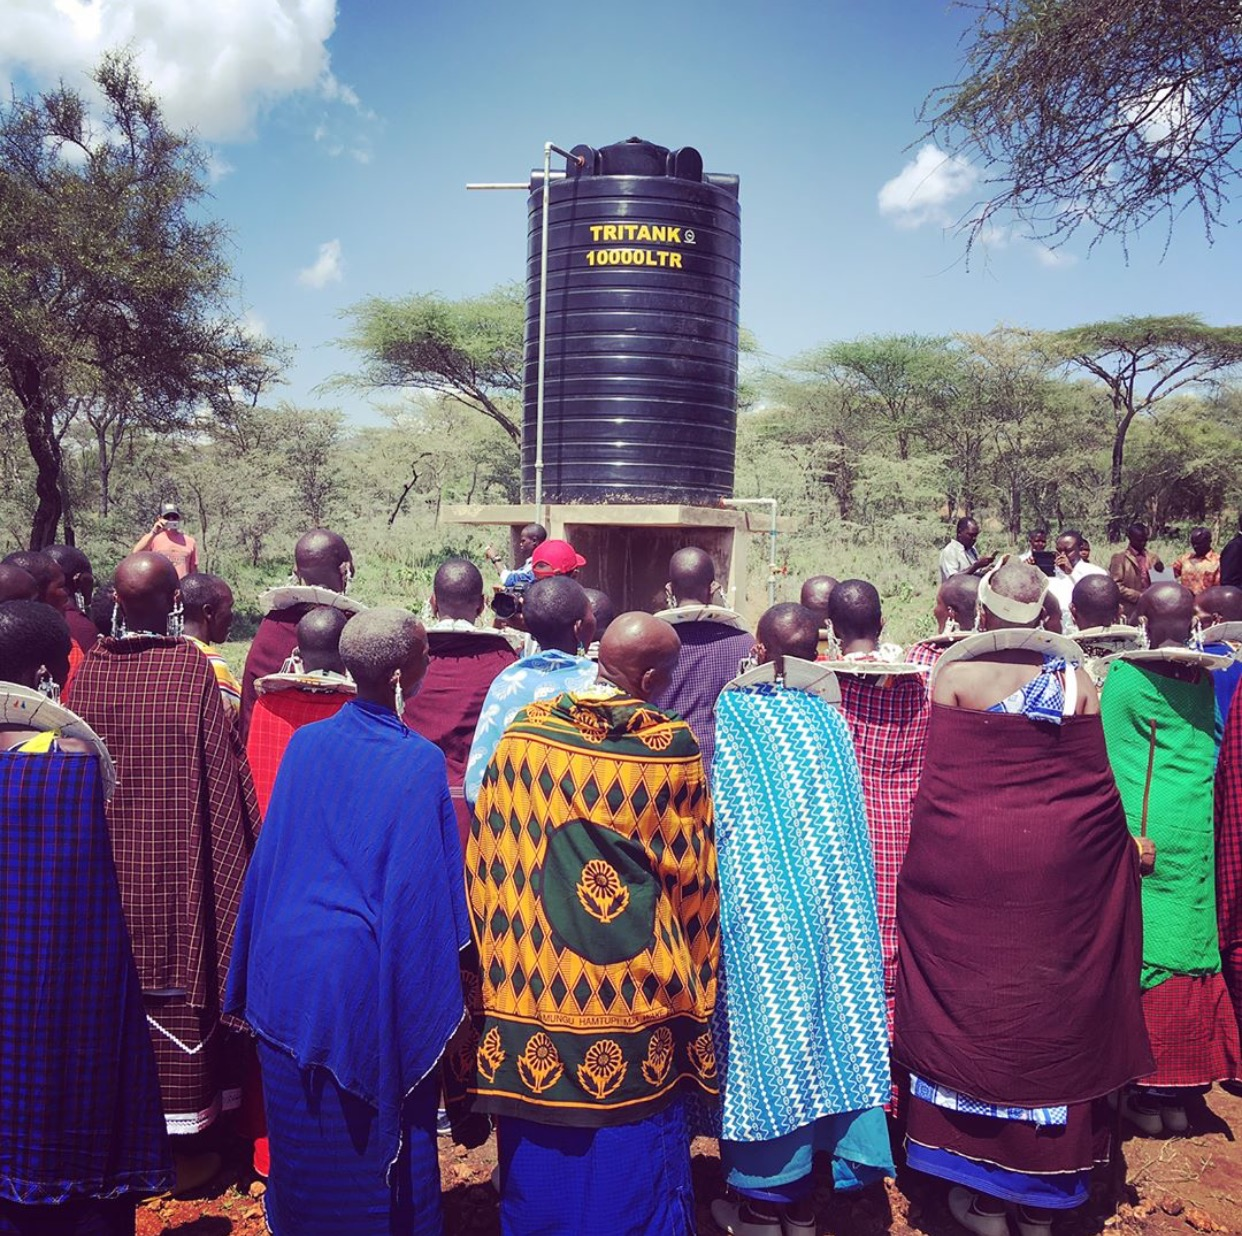 Waterboys Project in Tanzania